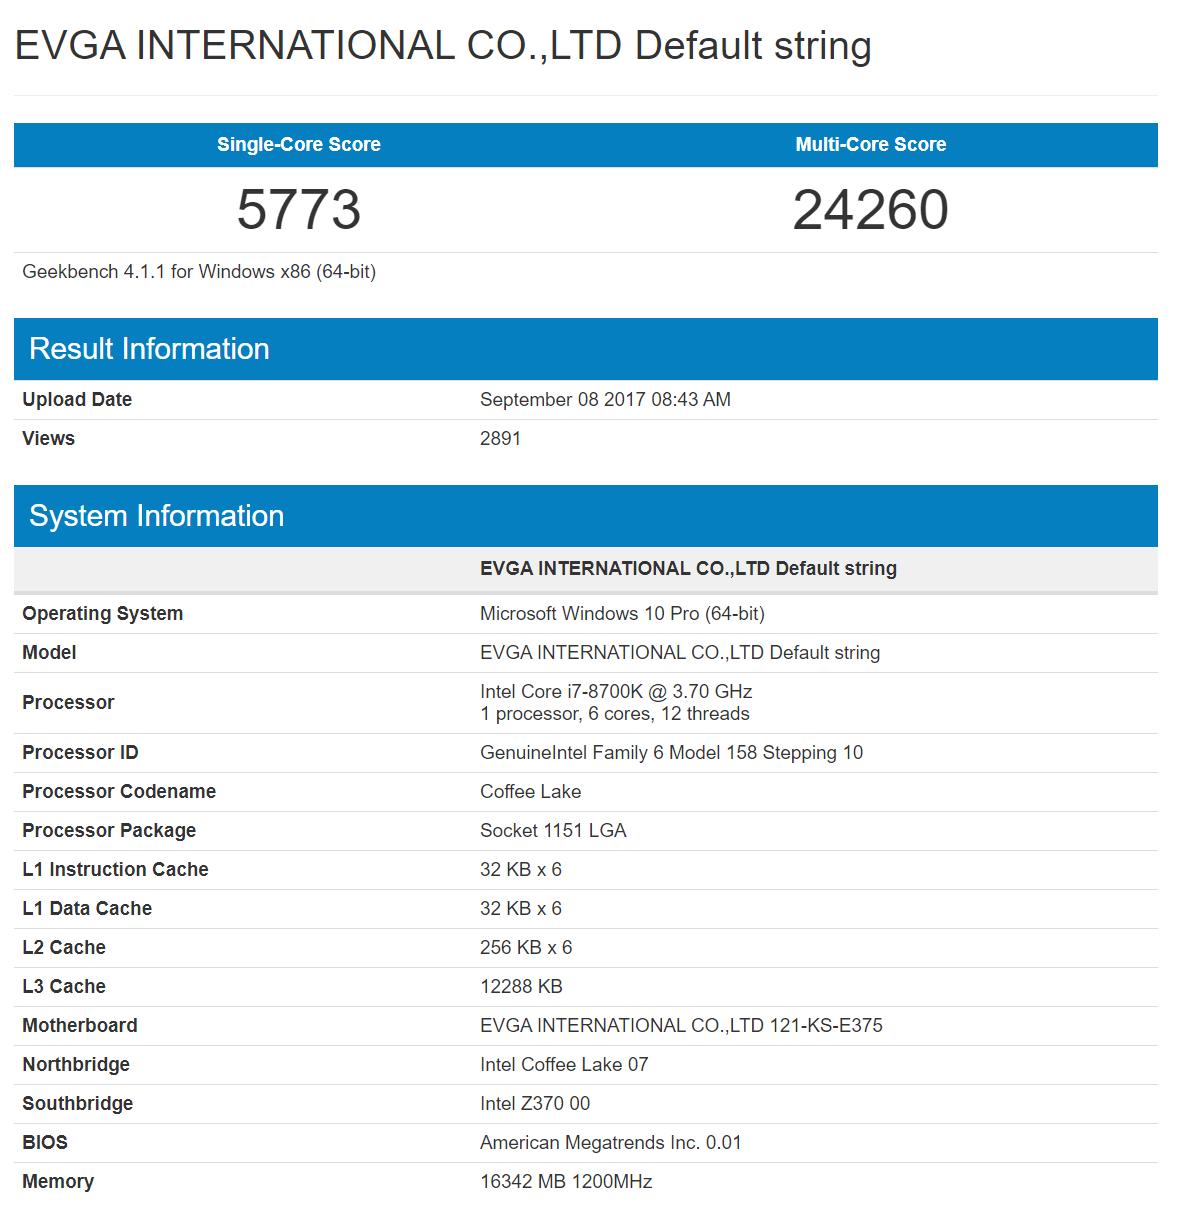 Early Intel Core i7-8700K Benchmarks Leaked, Barely Beats Ryzen 5 1600